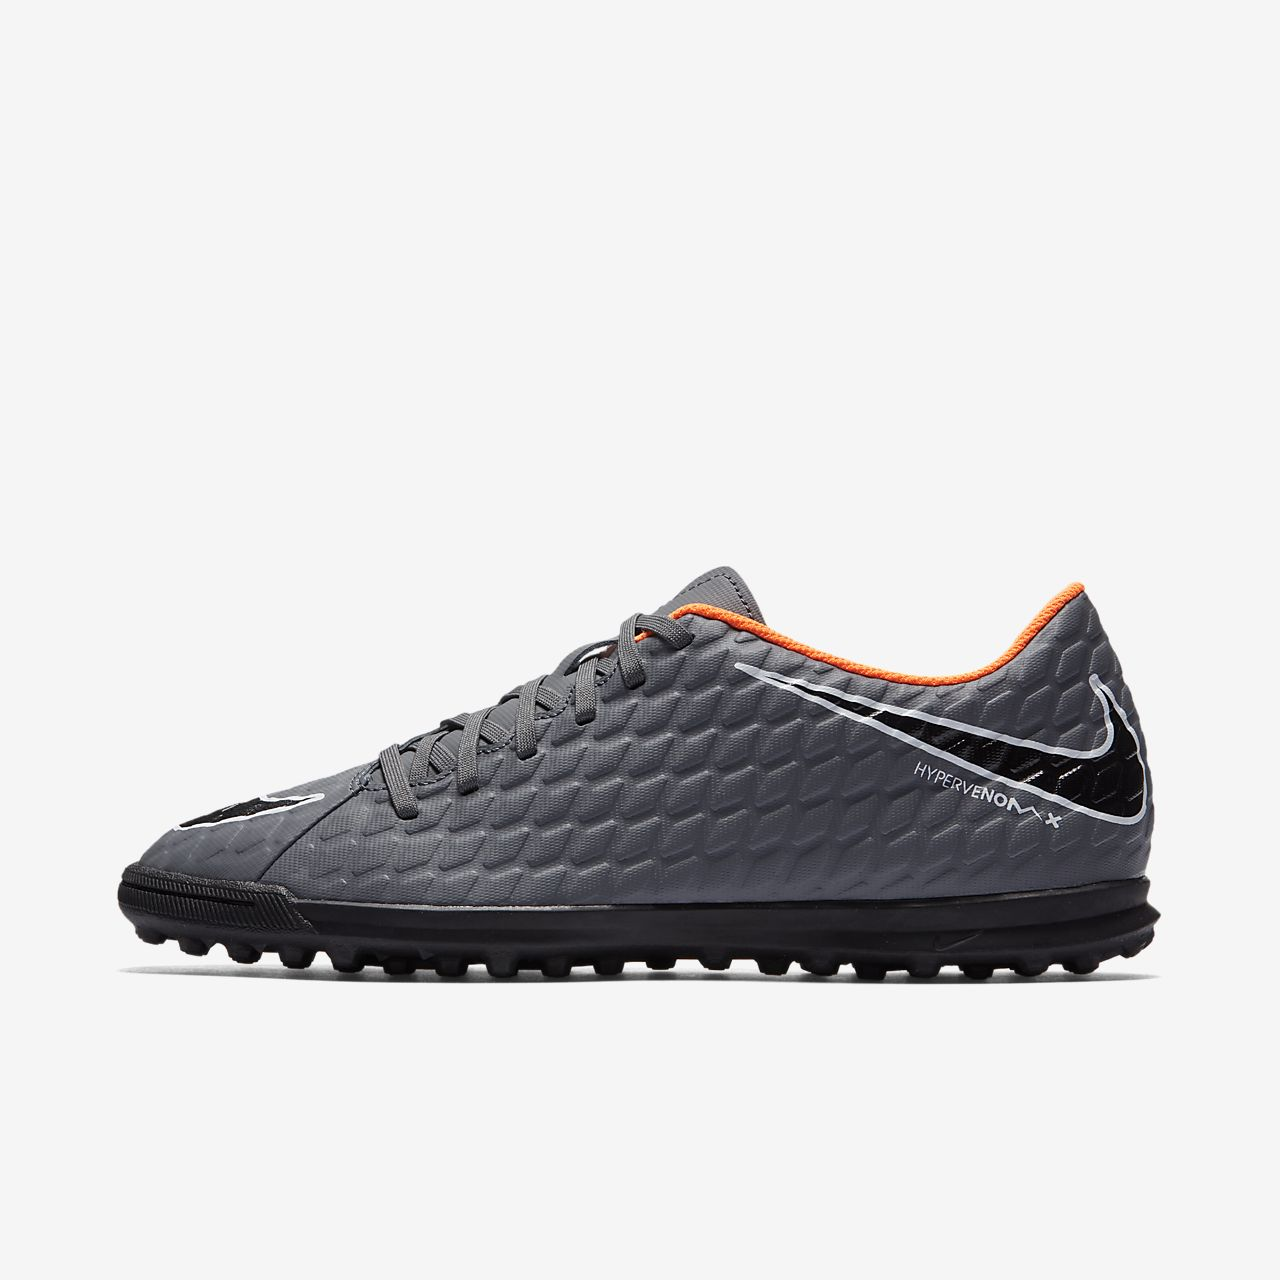 Nike Hypervenom PhantomX III Club TF Dark Grey White Total Orange AH7281081